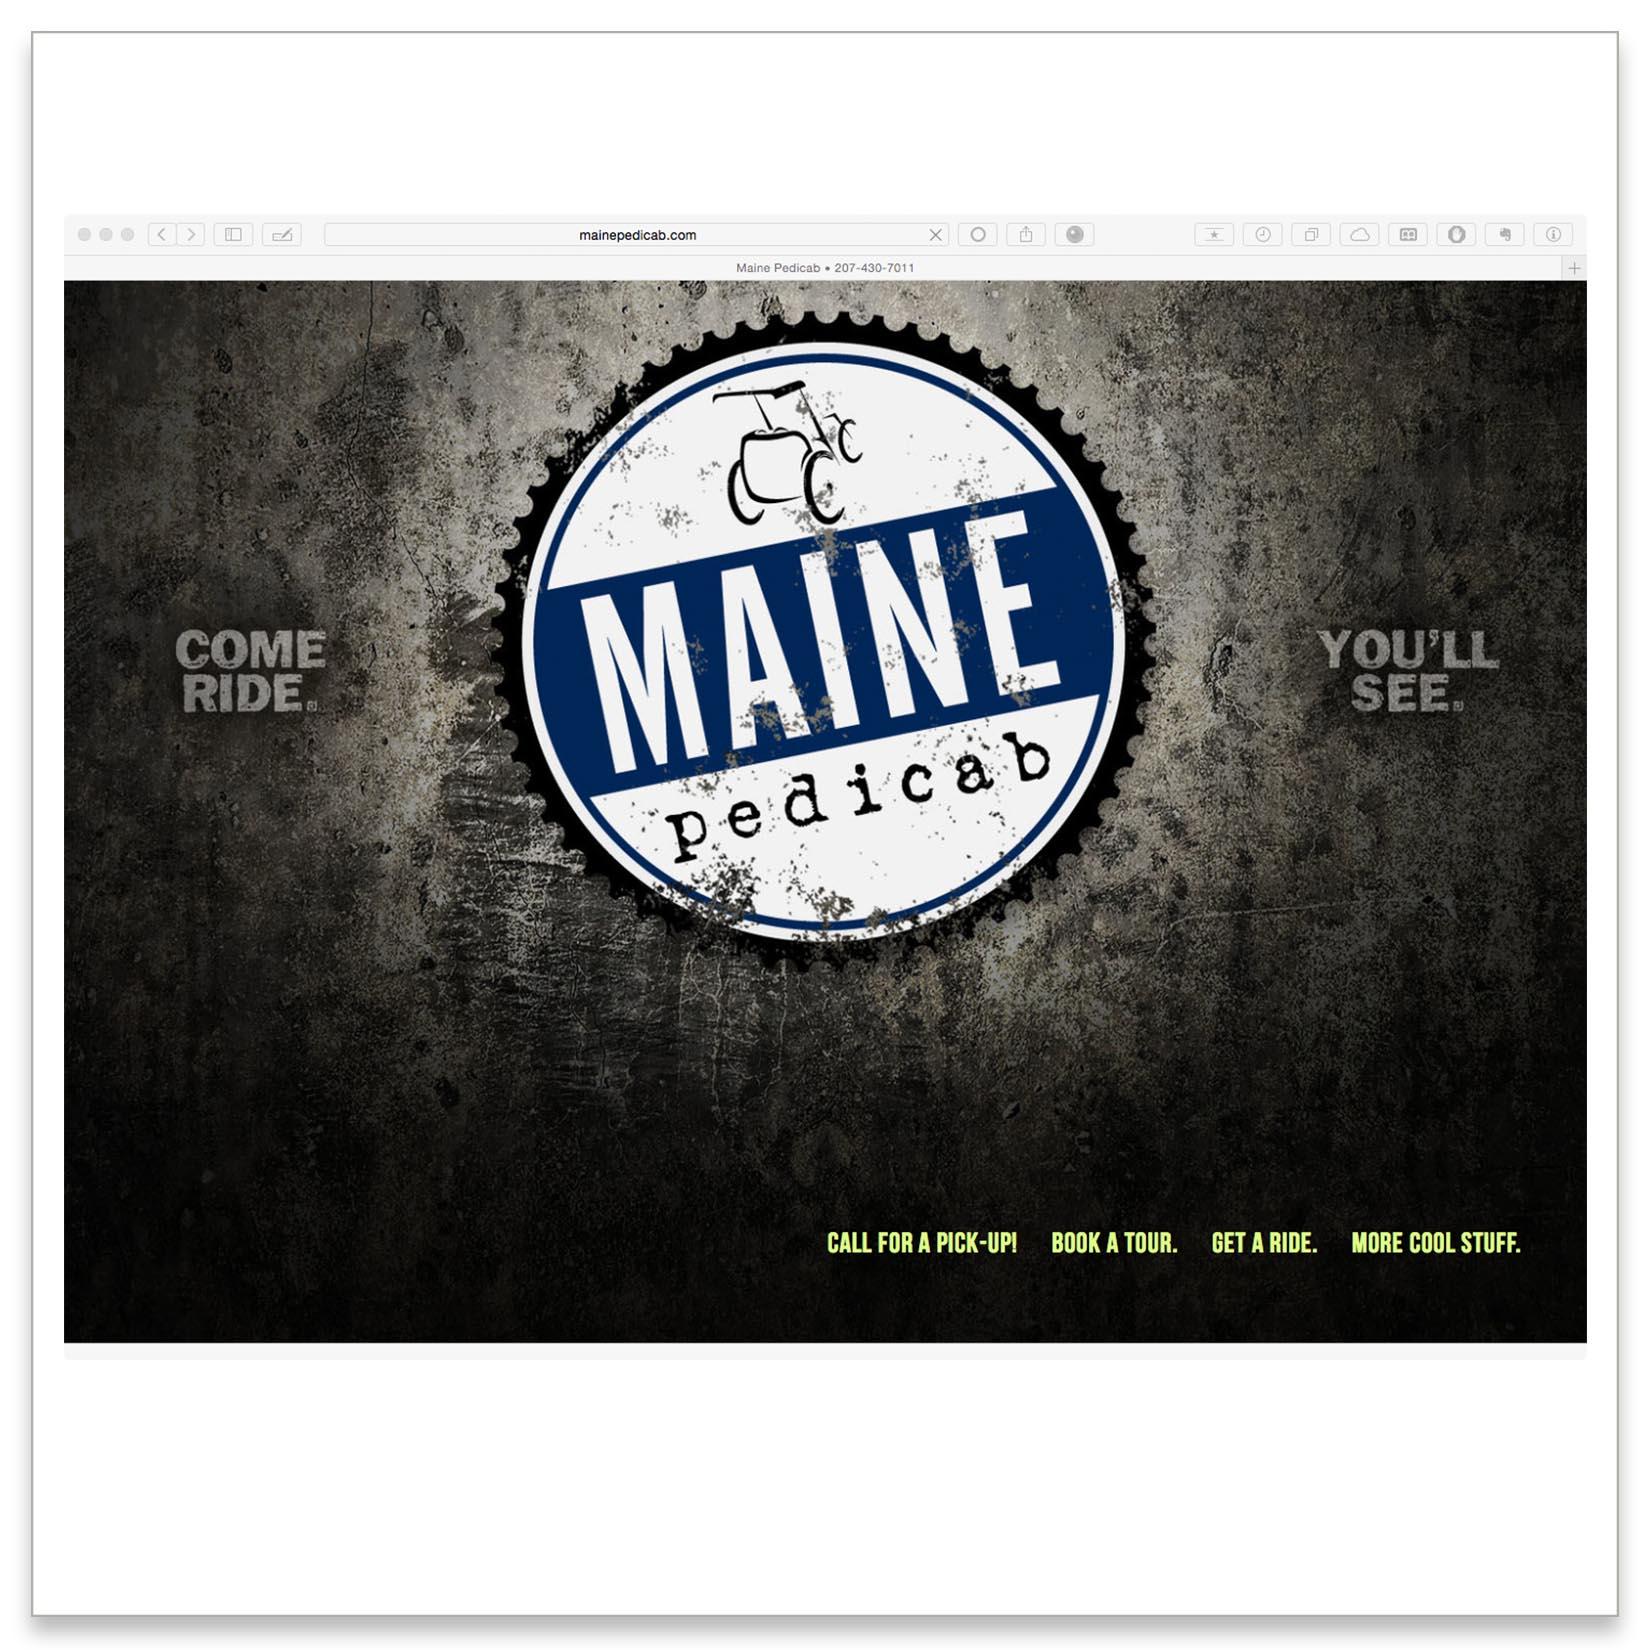 WorkSamples_Pedicab Maine.jpg